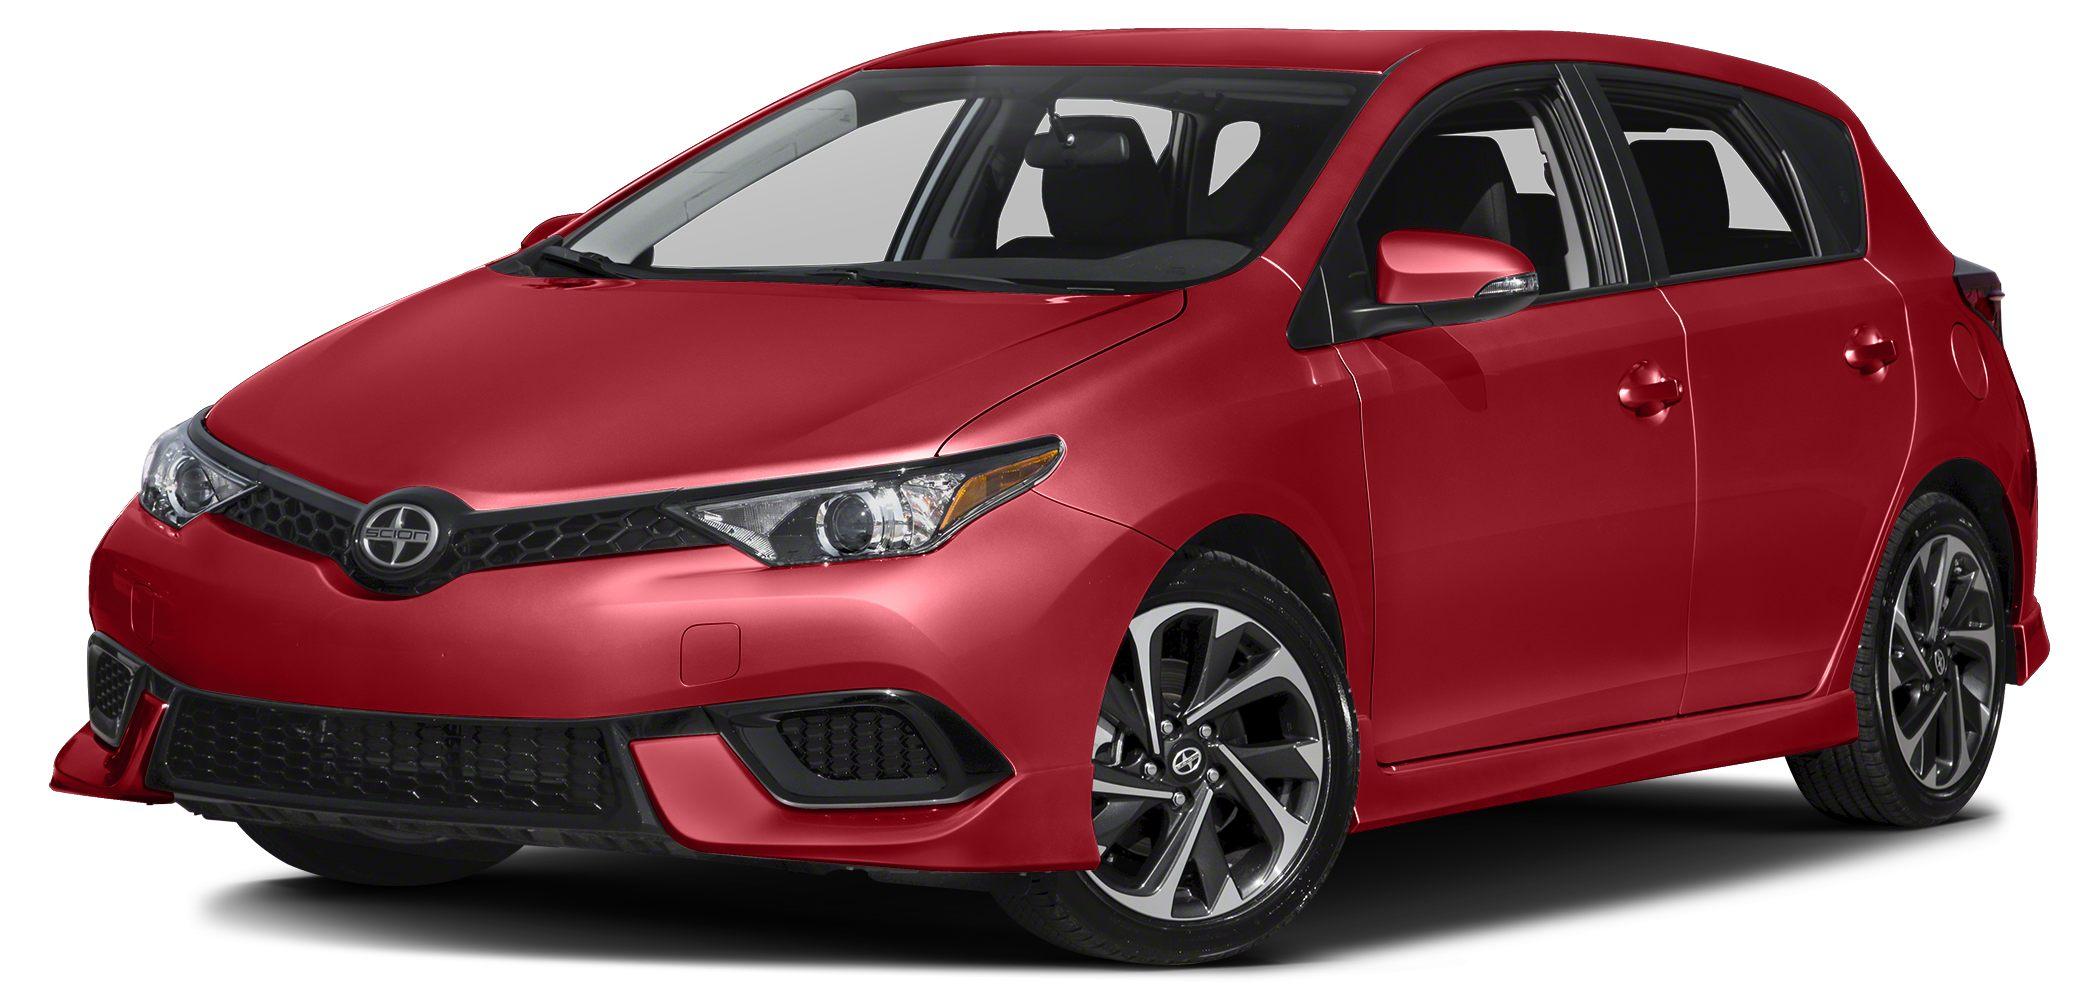 2016 Scion iM Base CARFAX 1-Owner ONLY 15819 Miles iM trim WAS 15690 EPA 37 MPG Hwy28 MPG